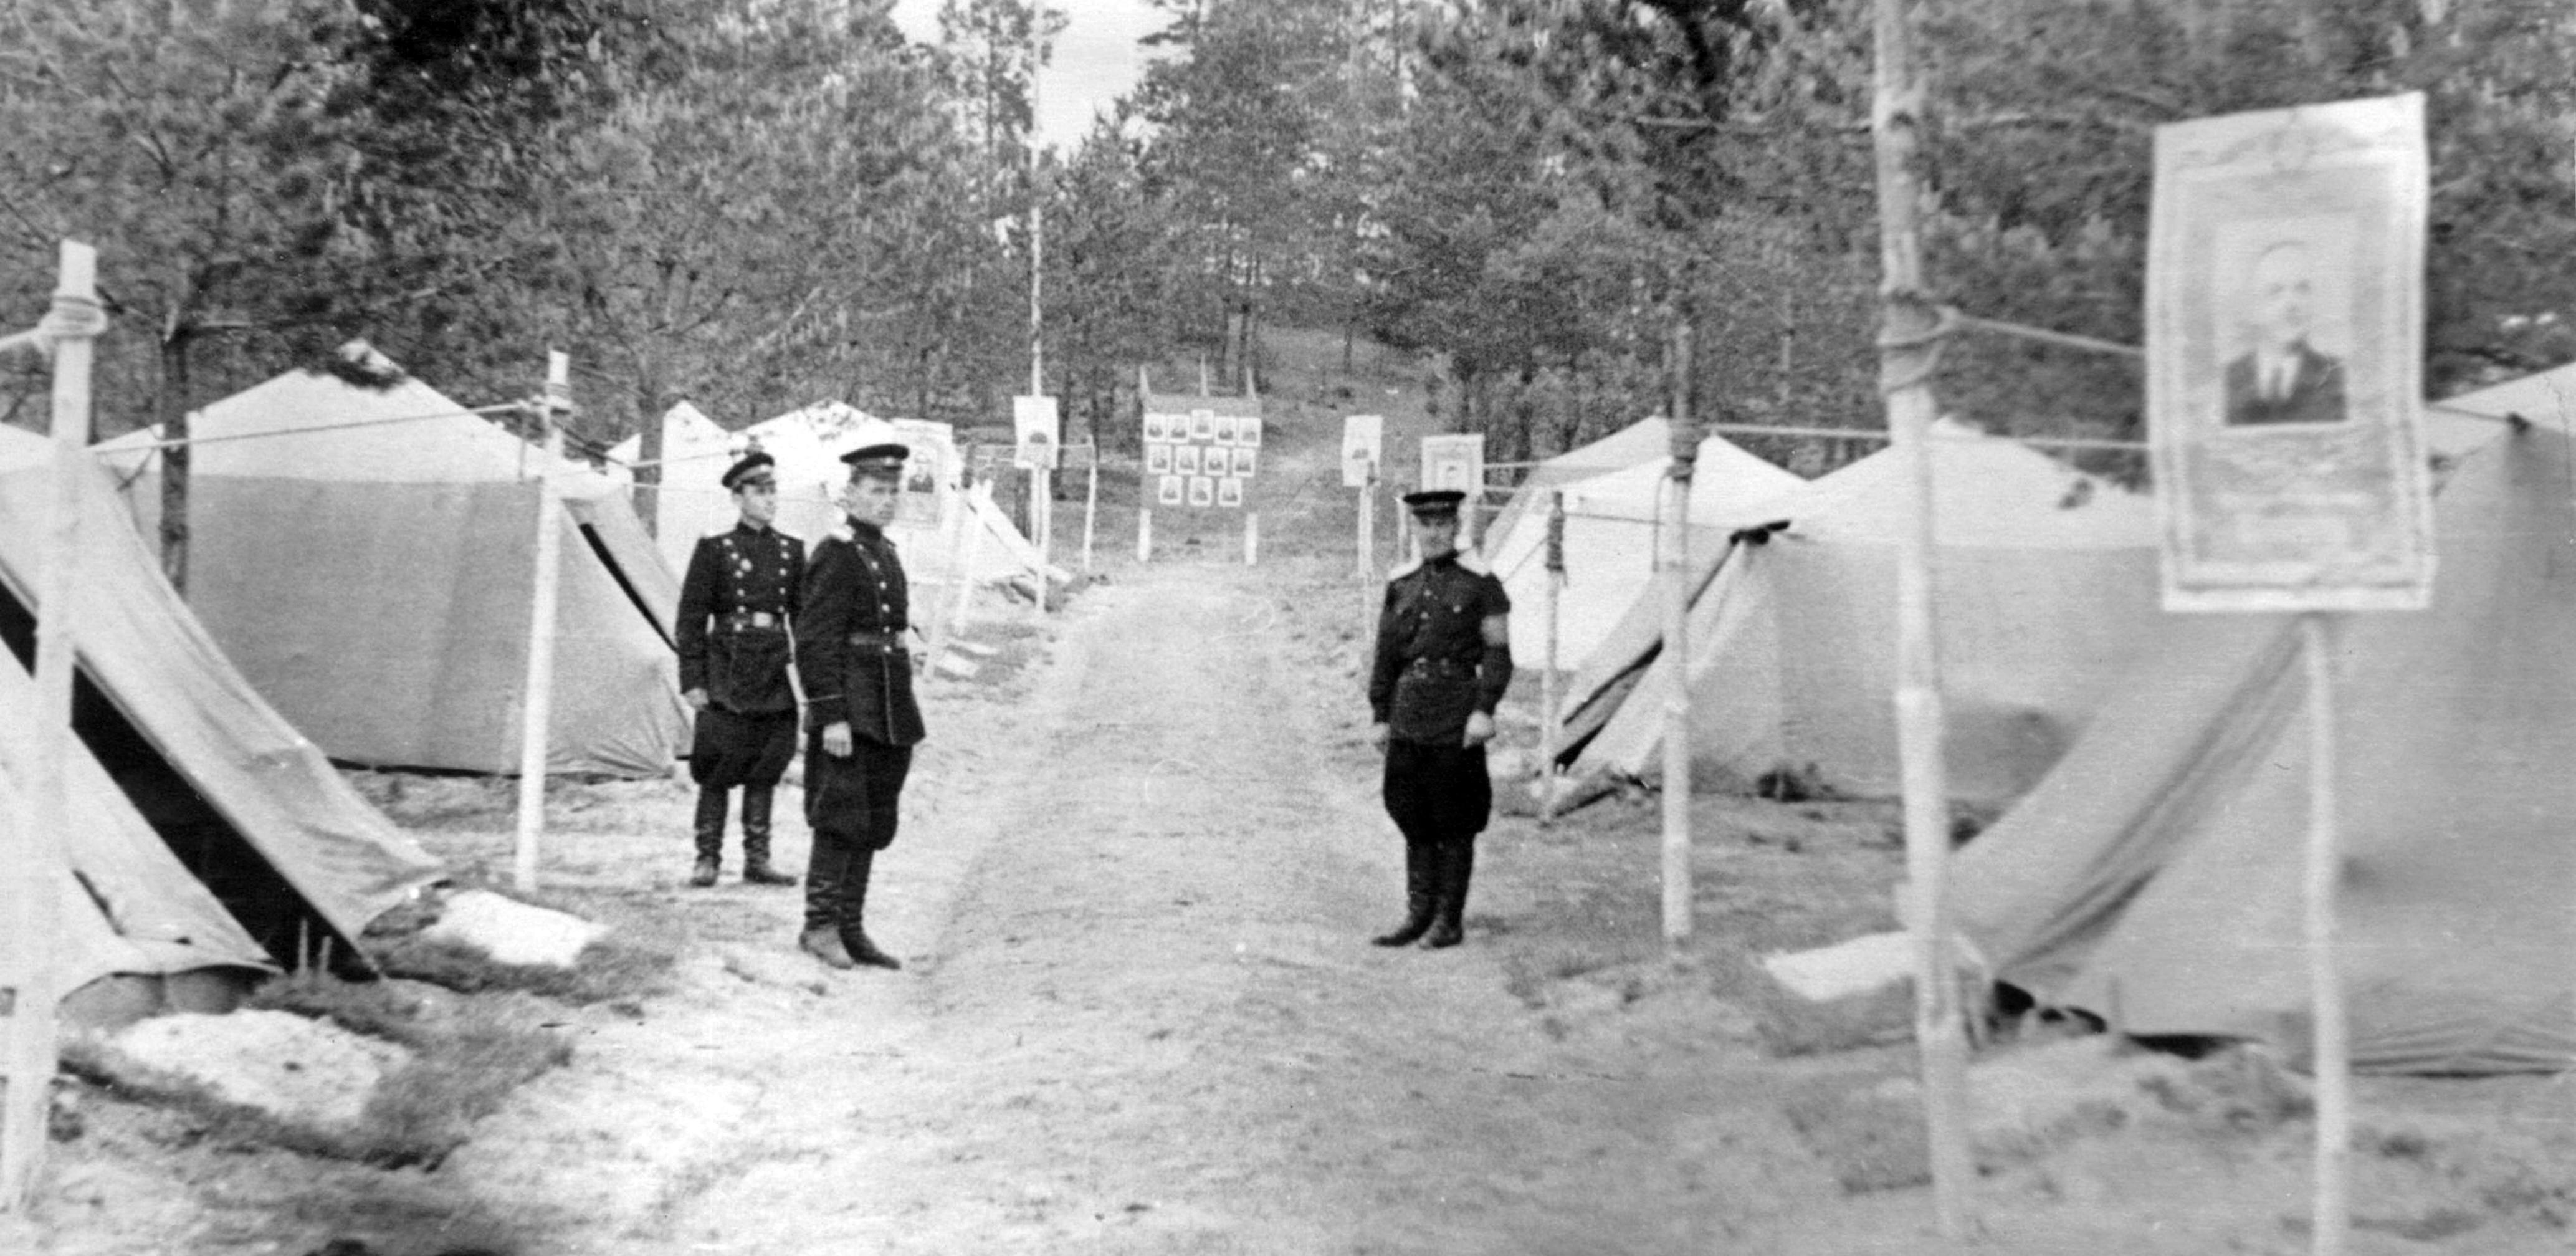 lagernyjj-sbor-um-minskojj-oblasti1954-god.jpg